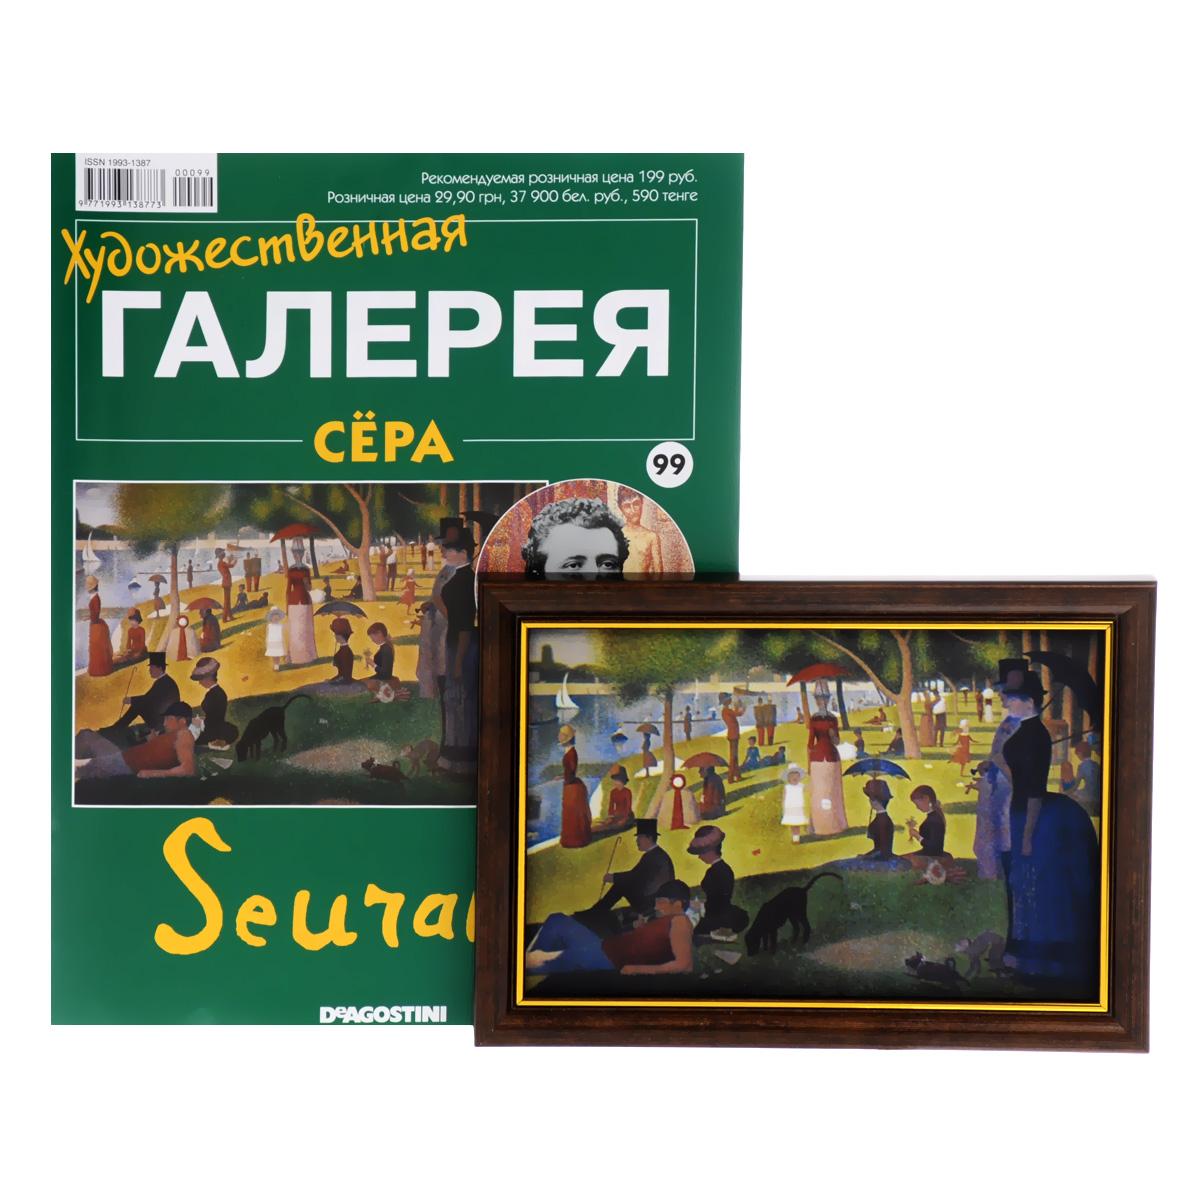 Журнал Художественная галерея № 99 журналы